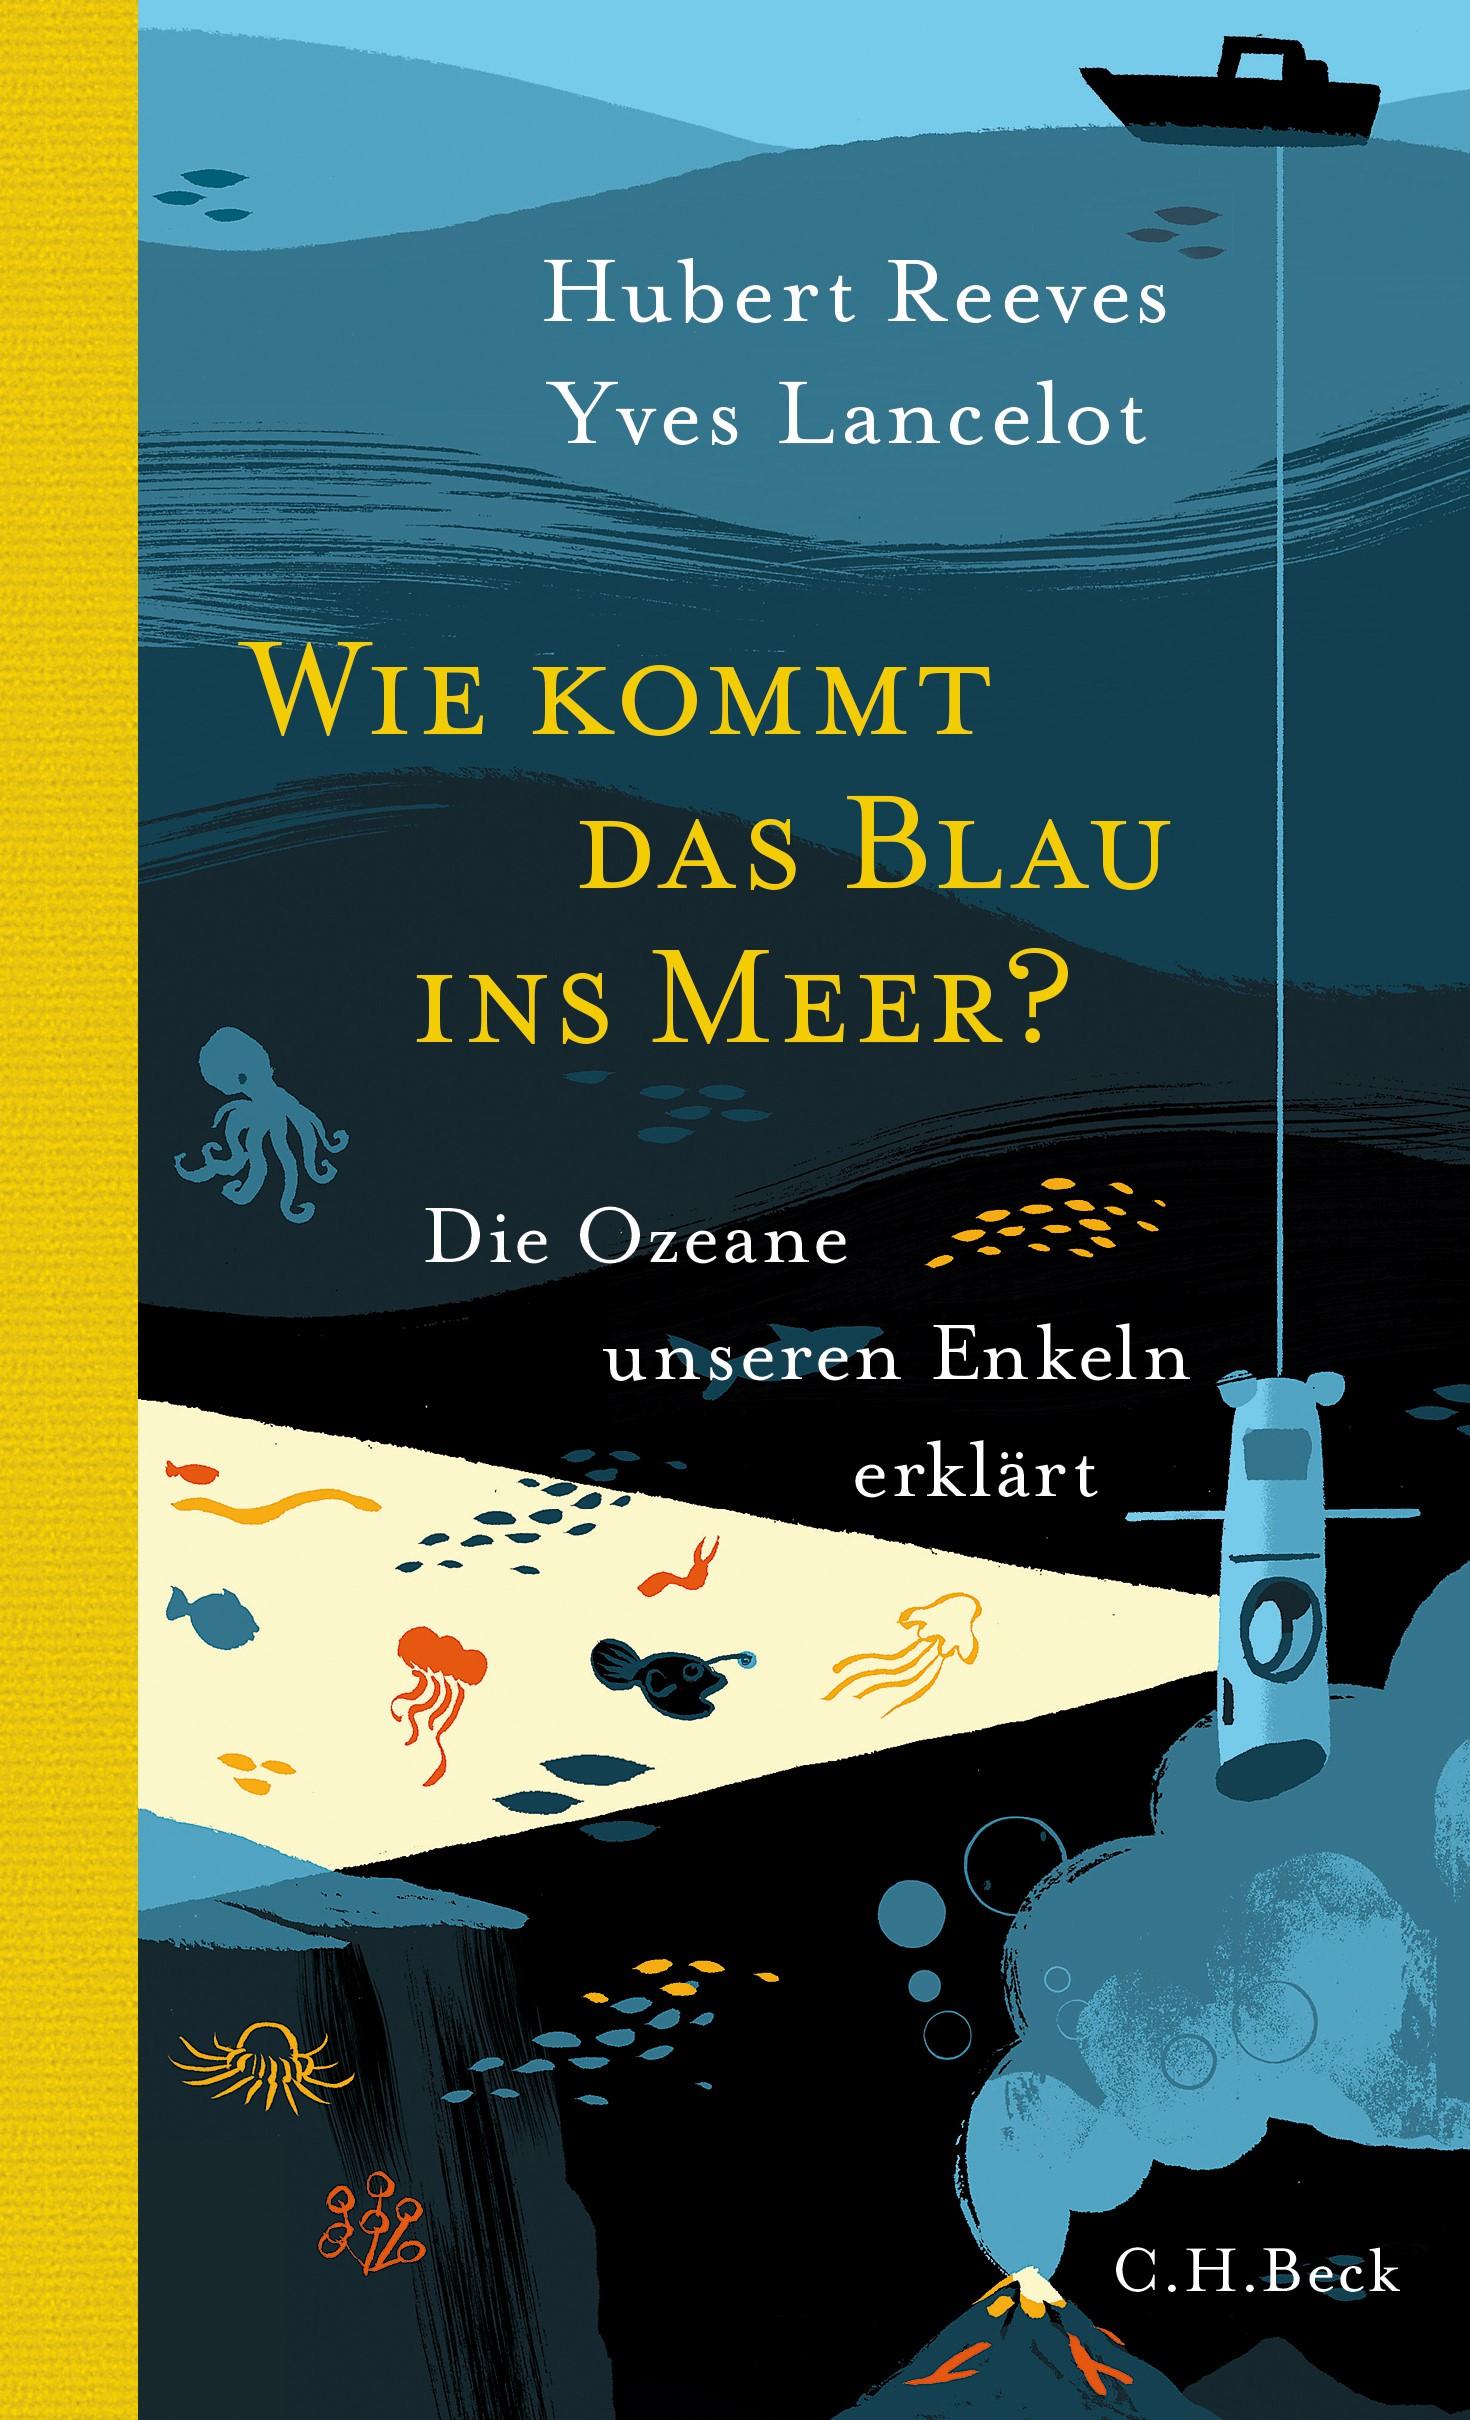 Cover des Buches 'Wie kommt das Blau ins Meer?'